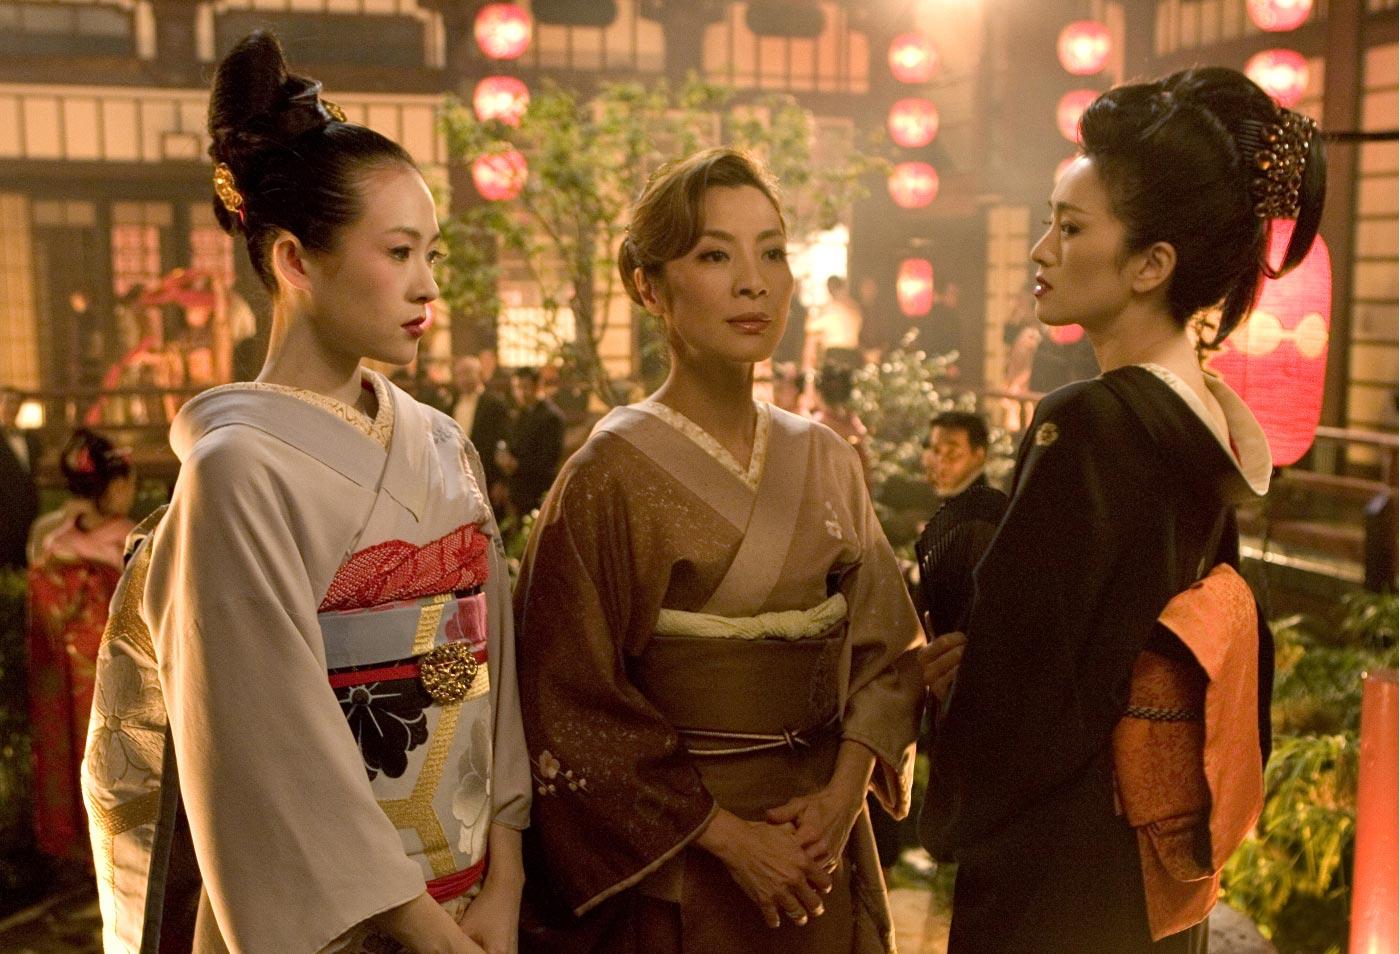 Rezultate imazhesh për memoirs of a geisha costumes